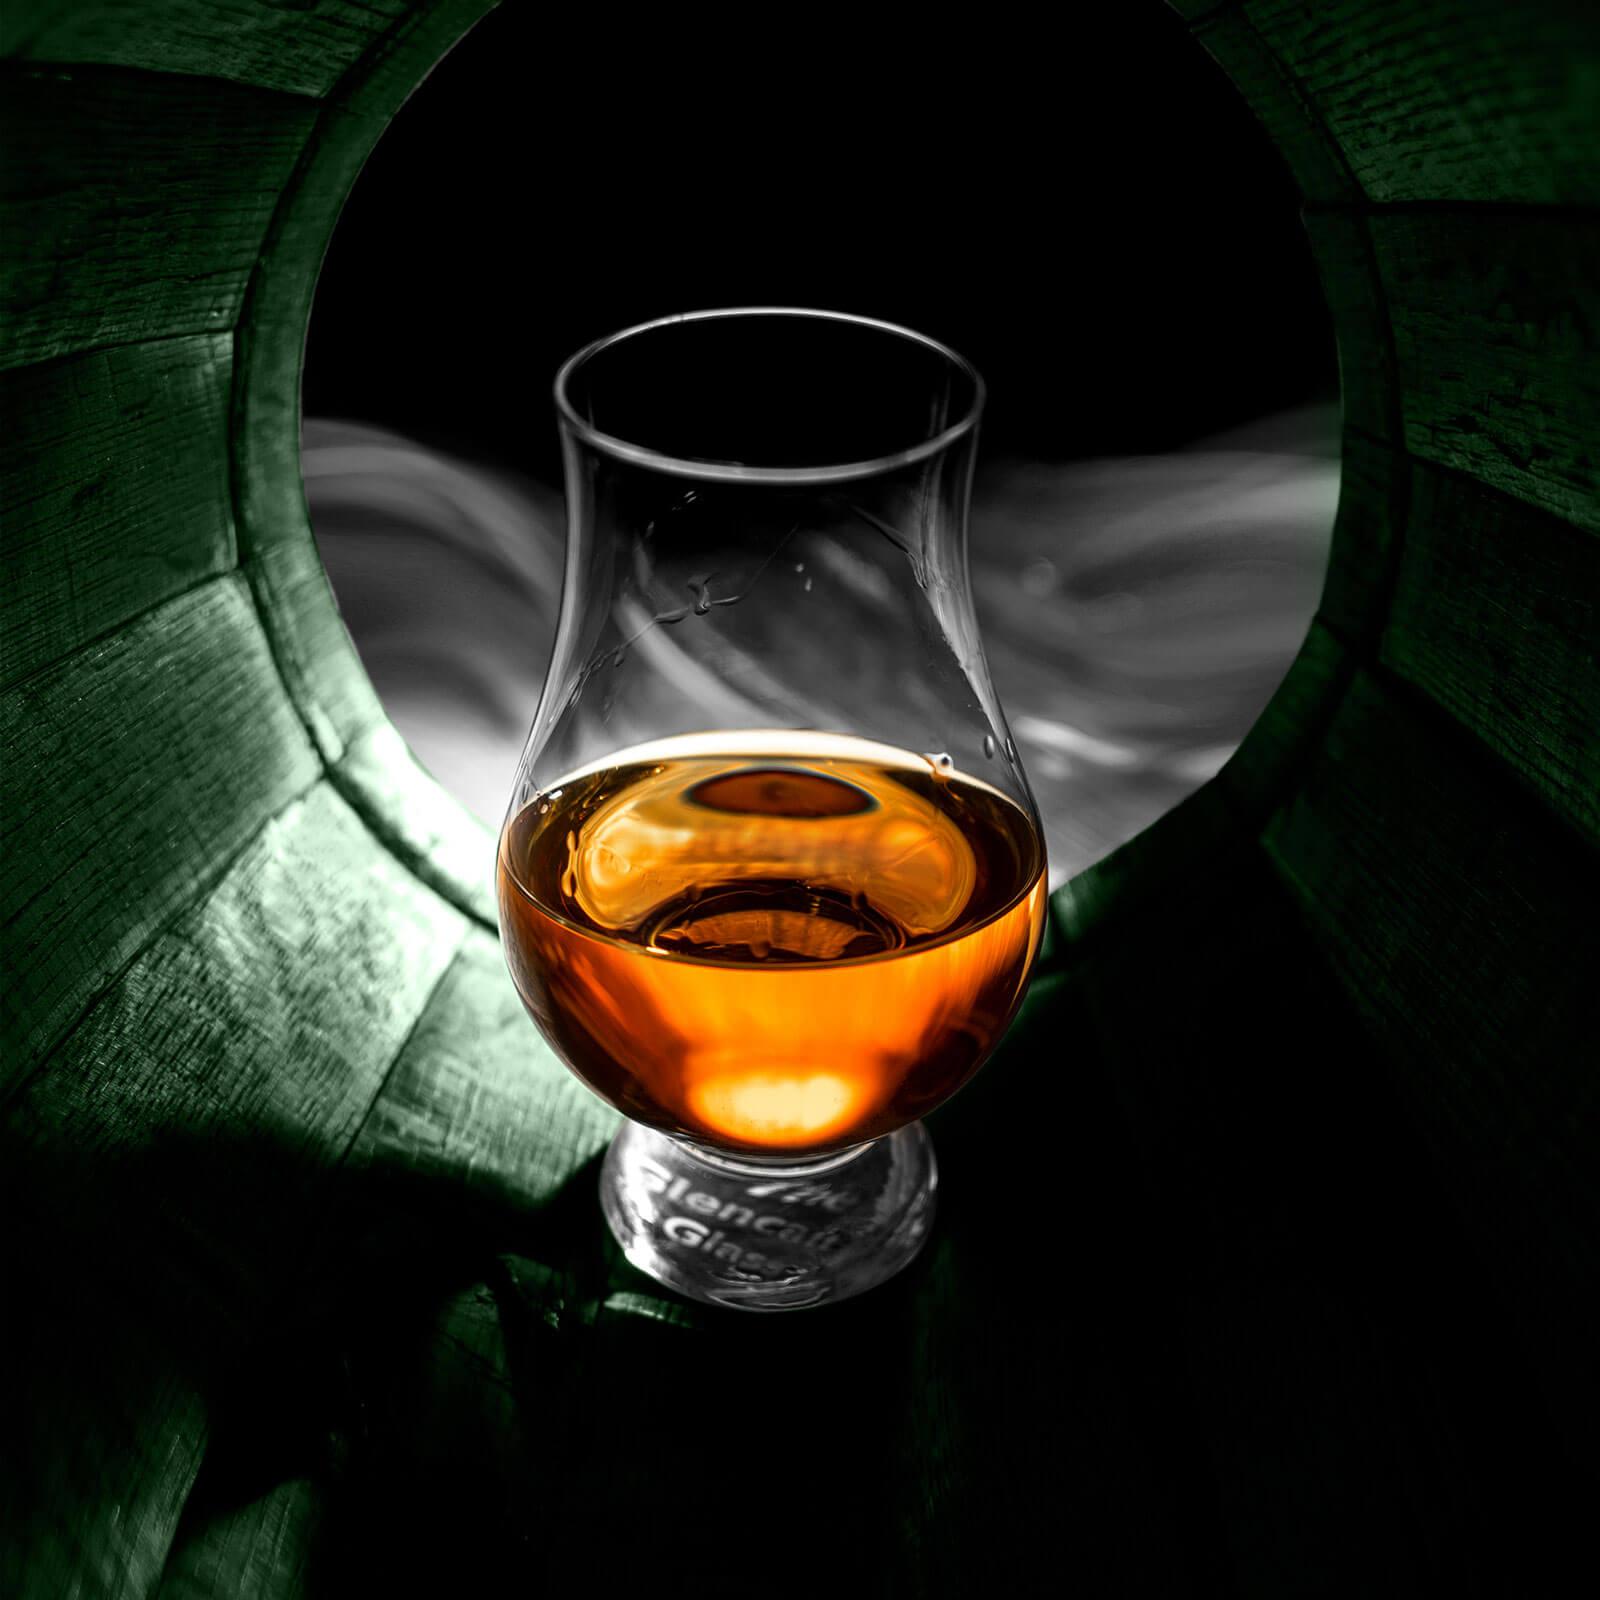 glass with oaksmith internationalinside a barrel